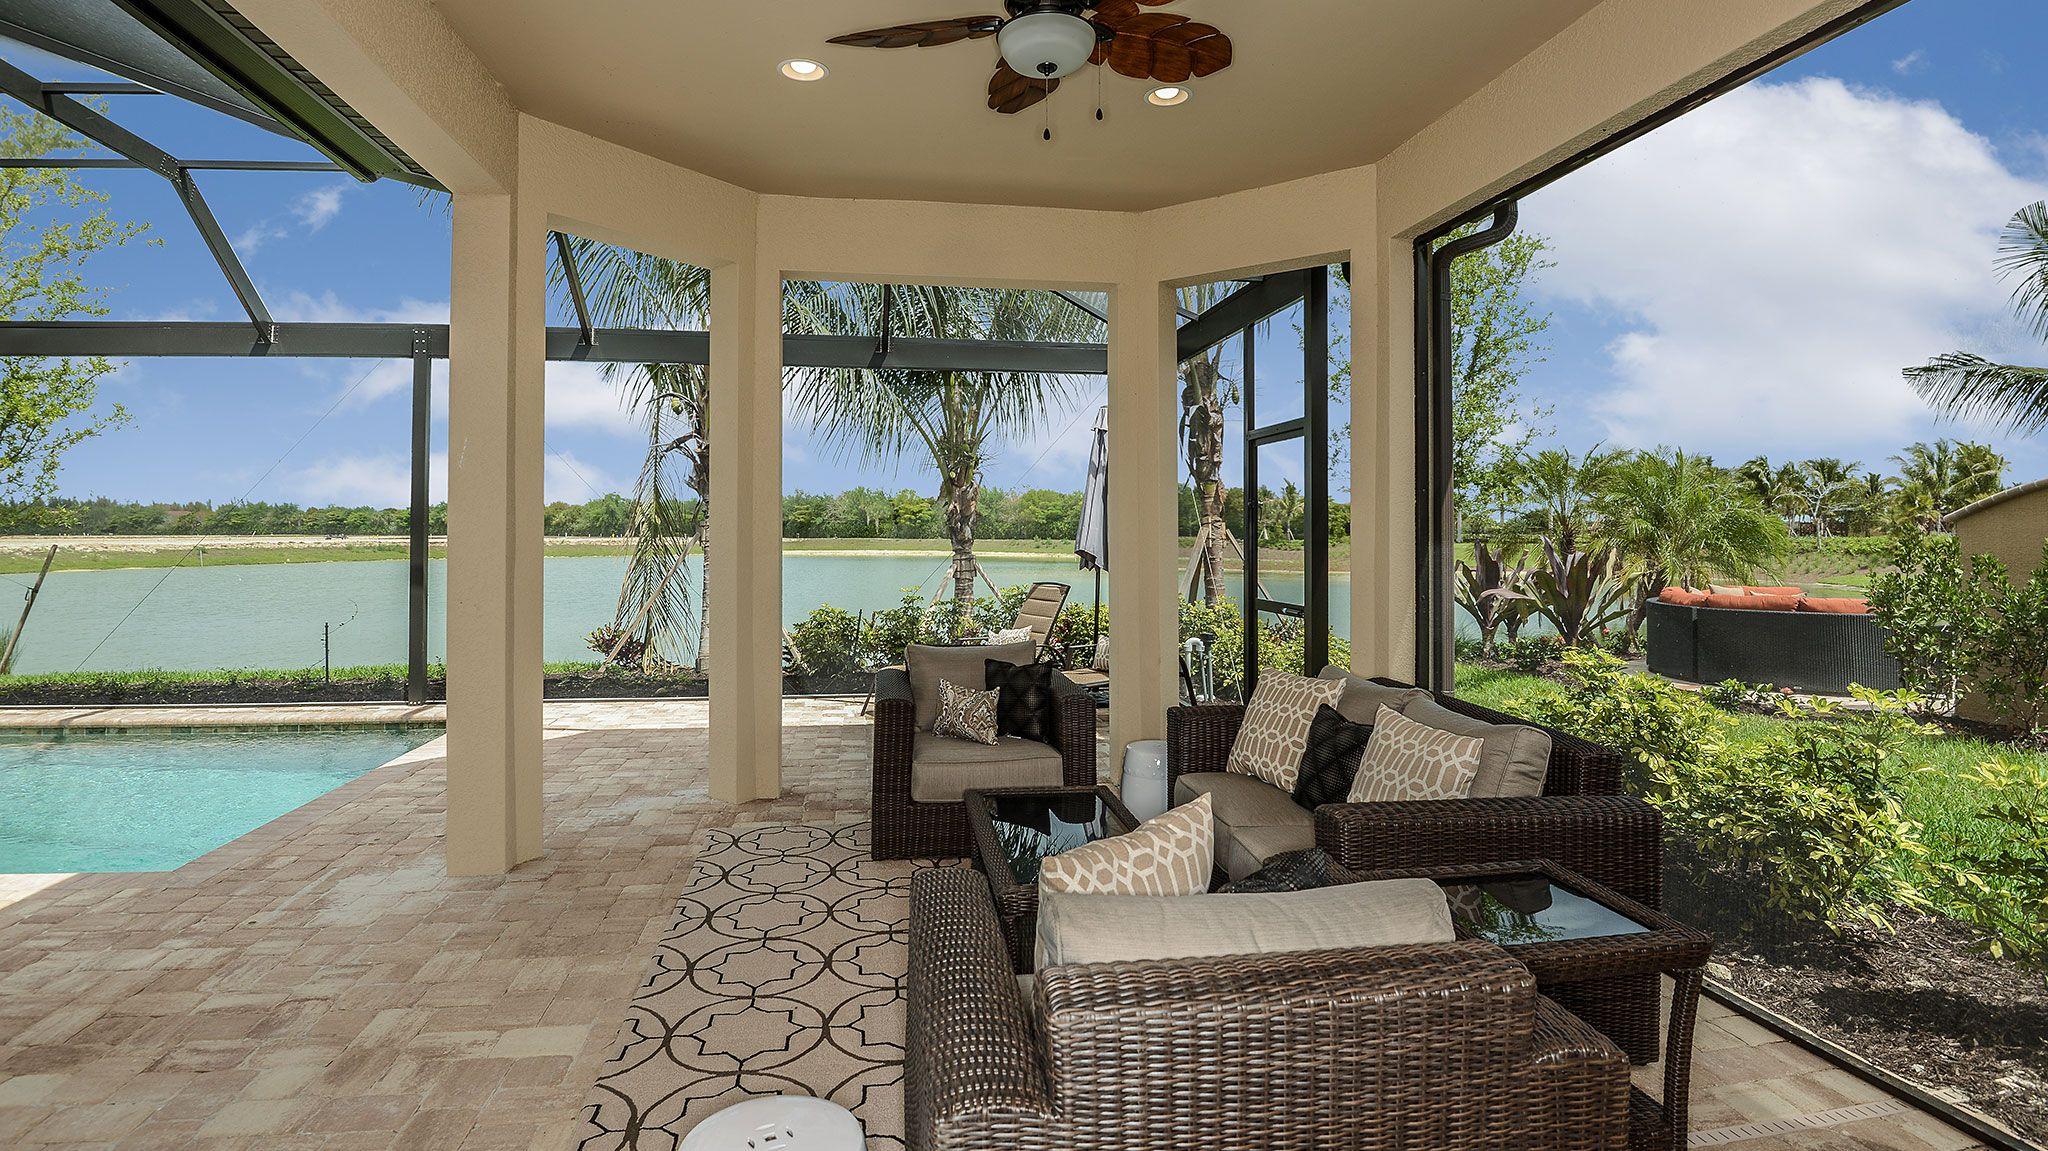 Photo of Esplanade by Siesta Key in Sarasota, FL 34231